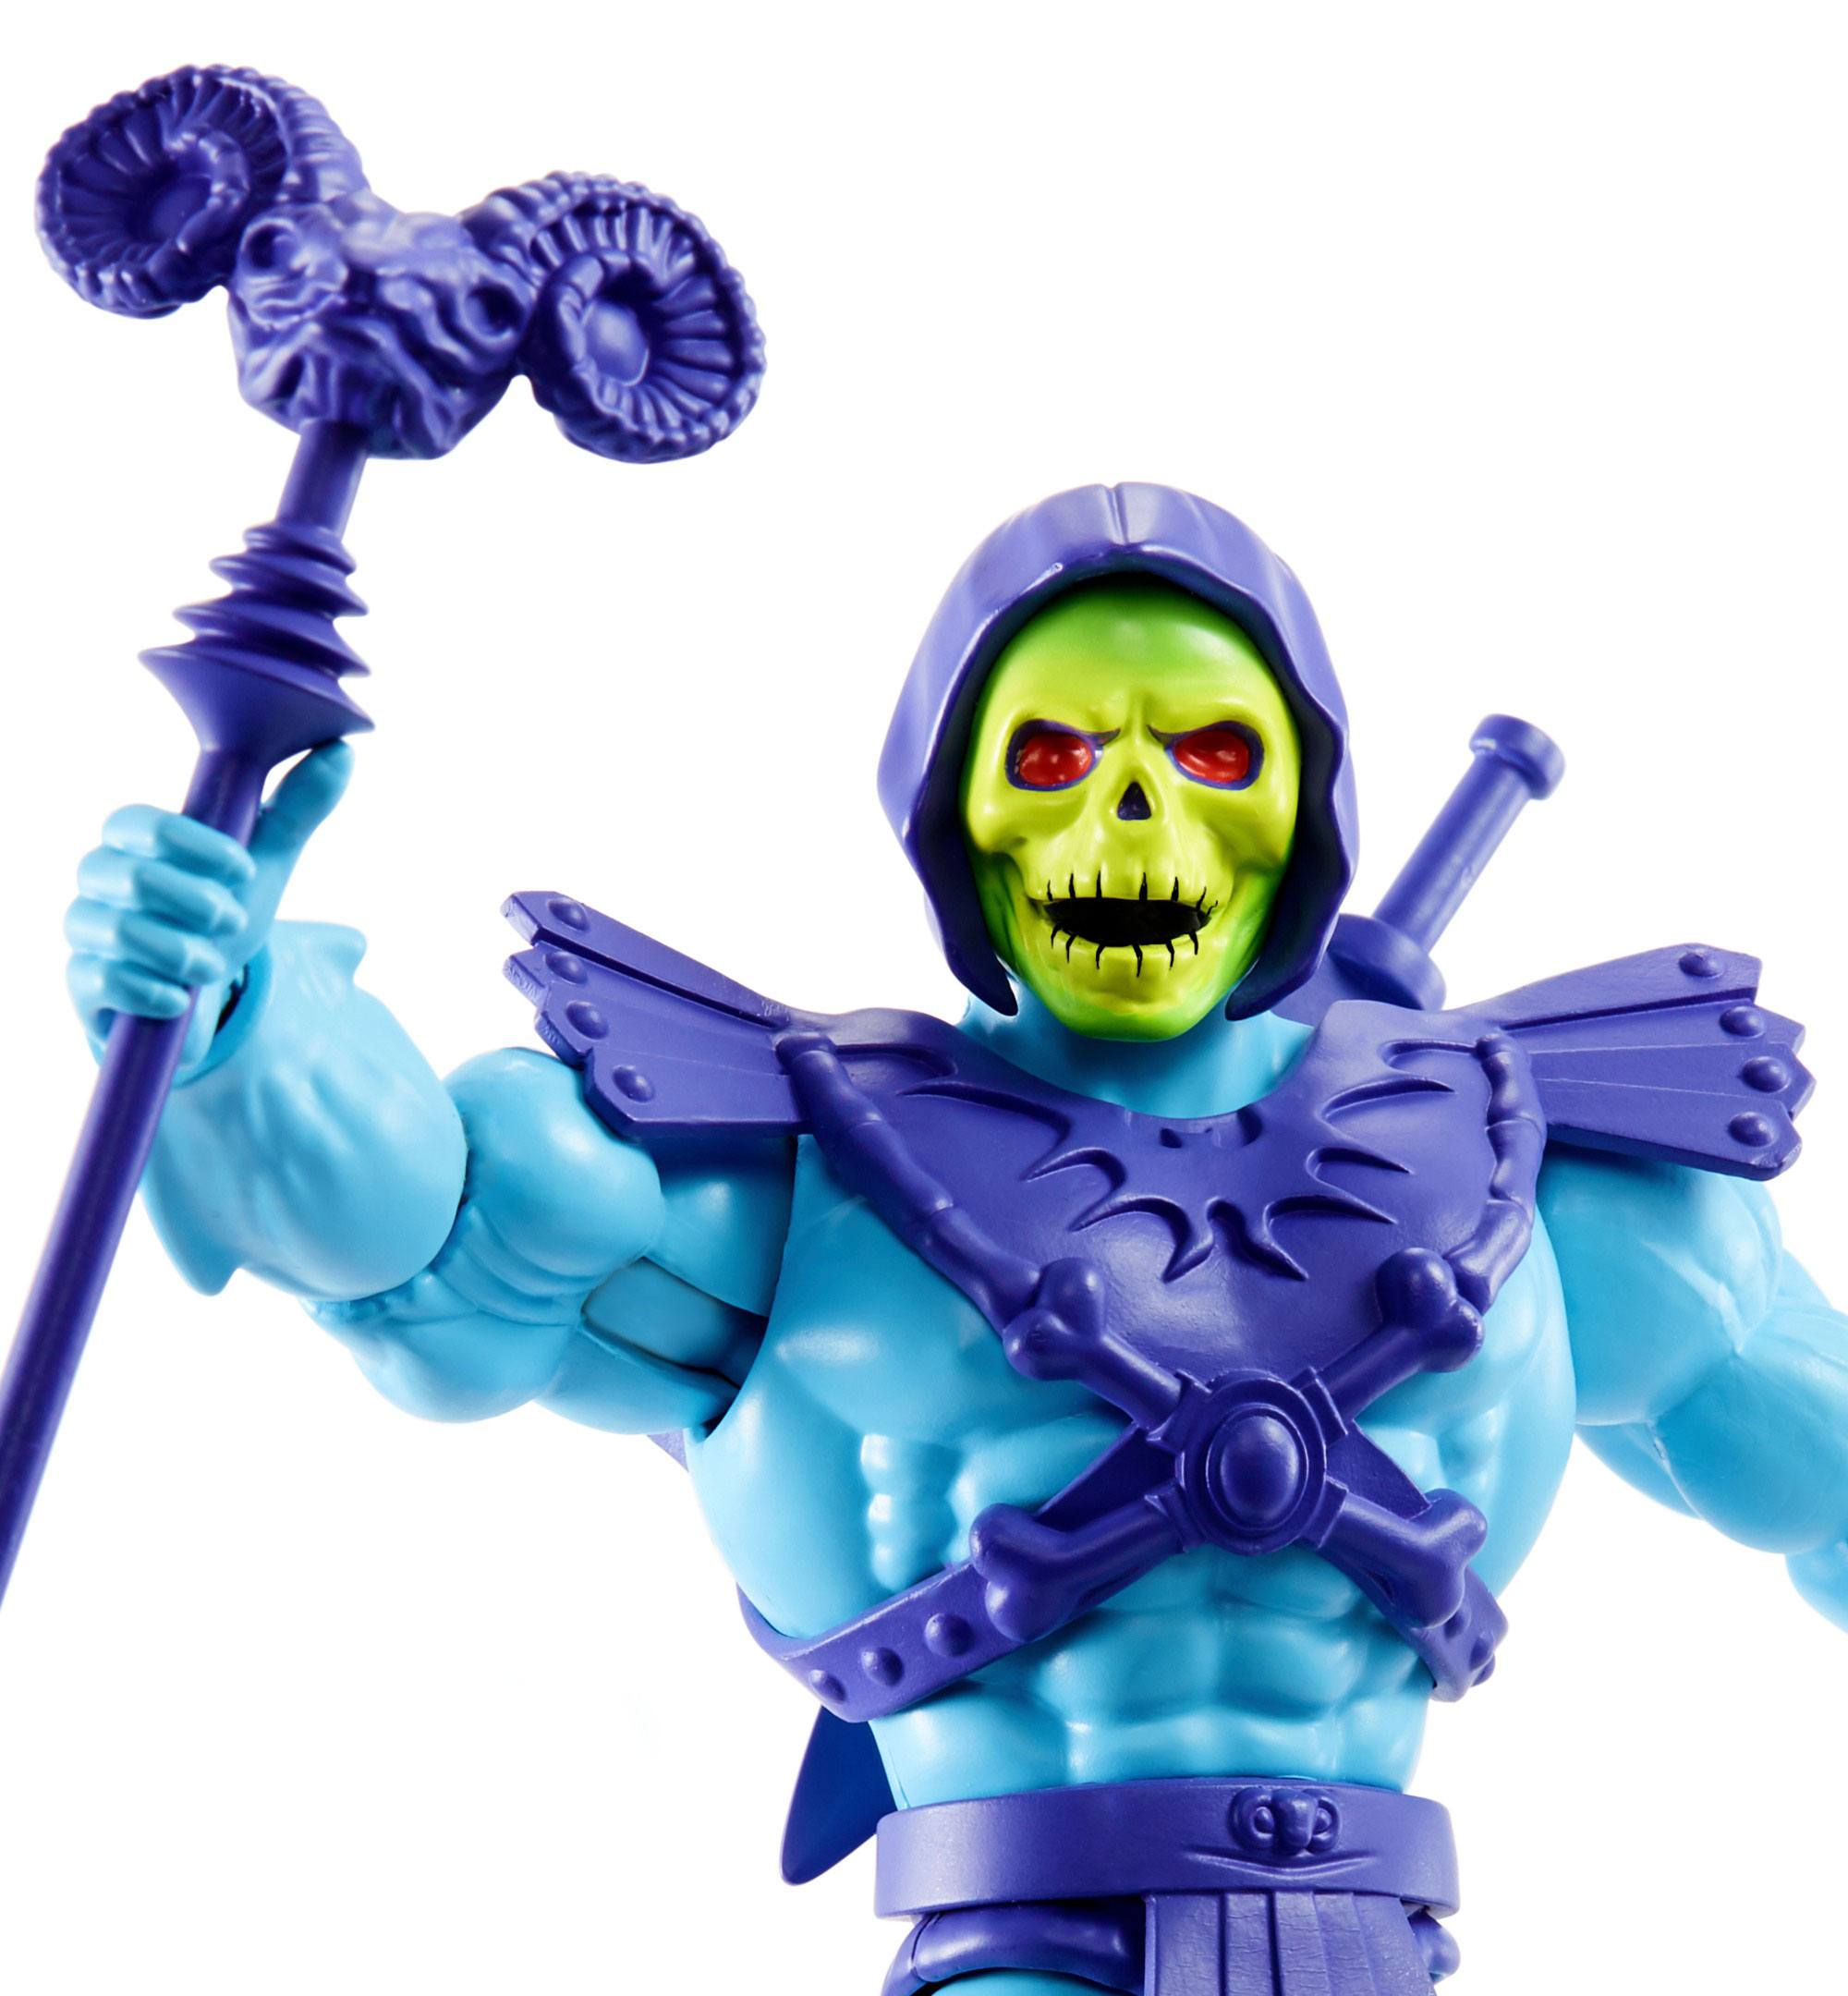 New for 20 Masters of the Universe Origins Actionfigur 2020 Skeletor 14 cm MATTGNN88 0887961875409